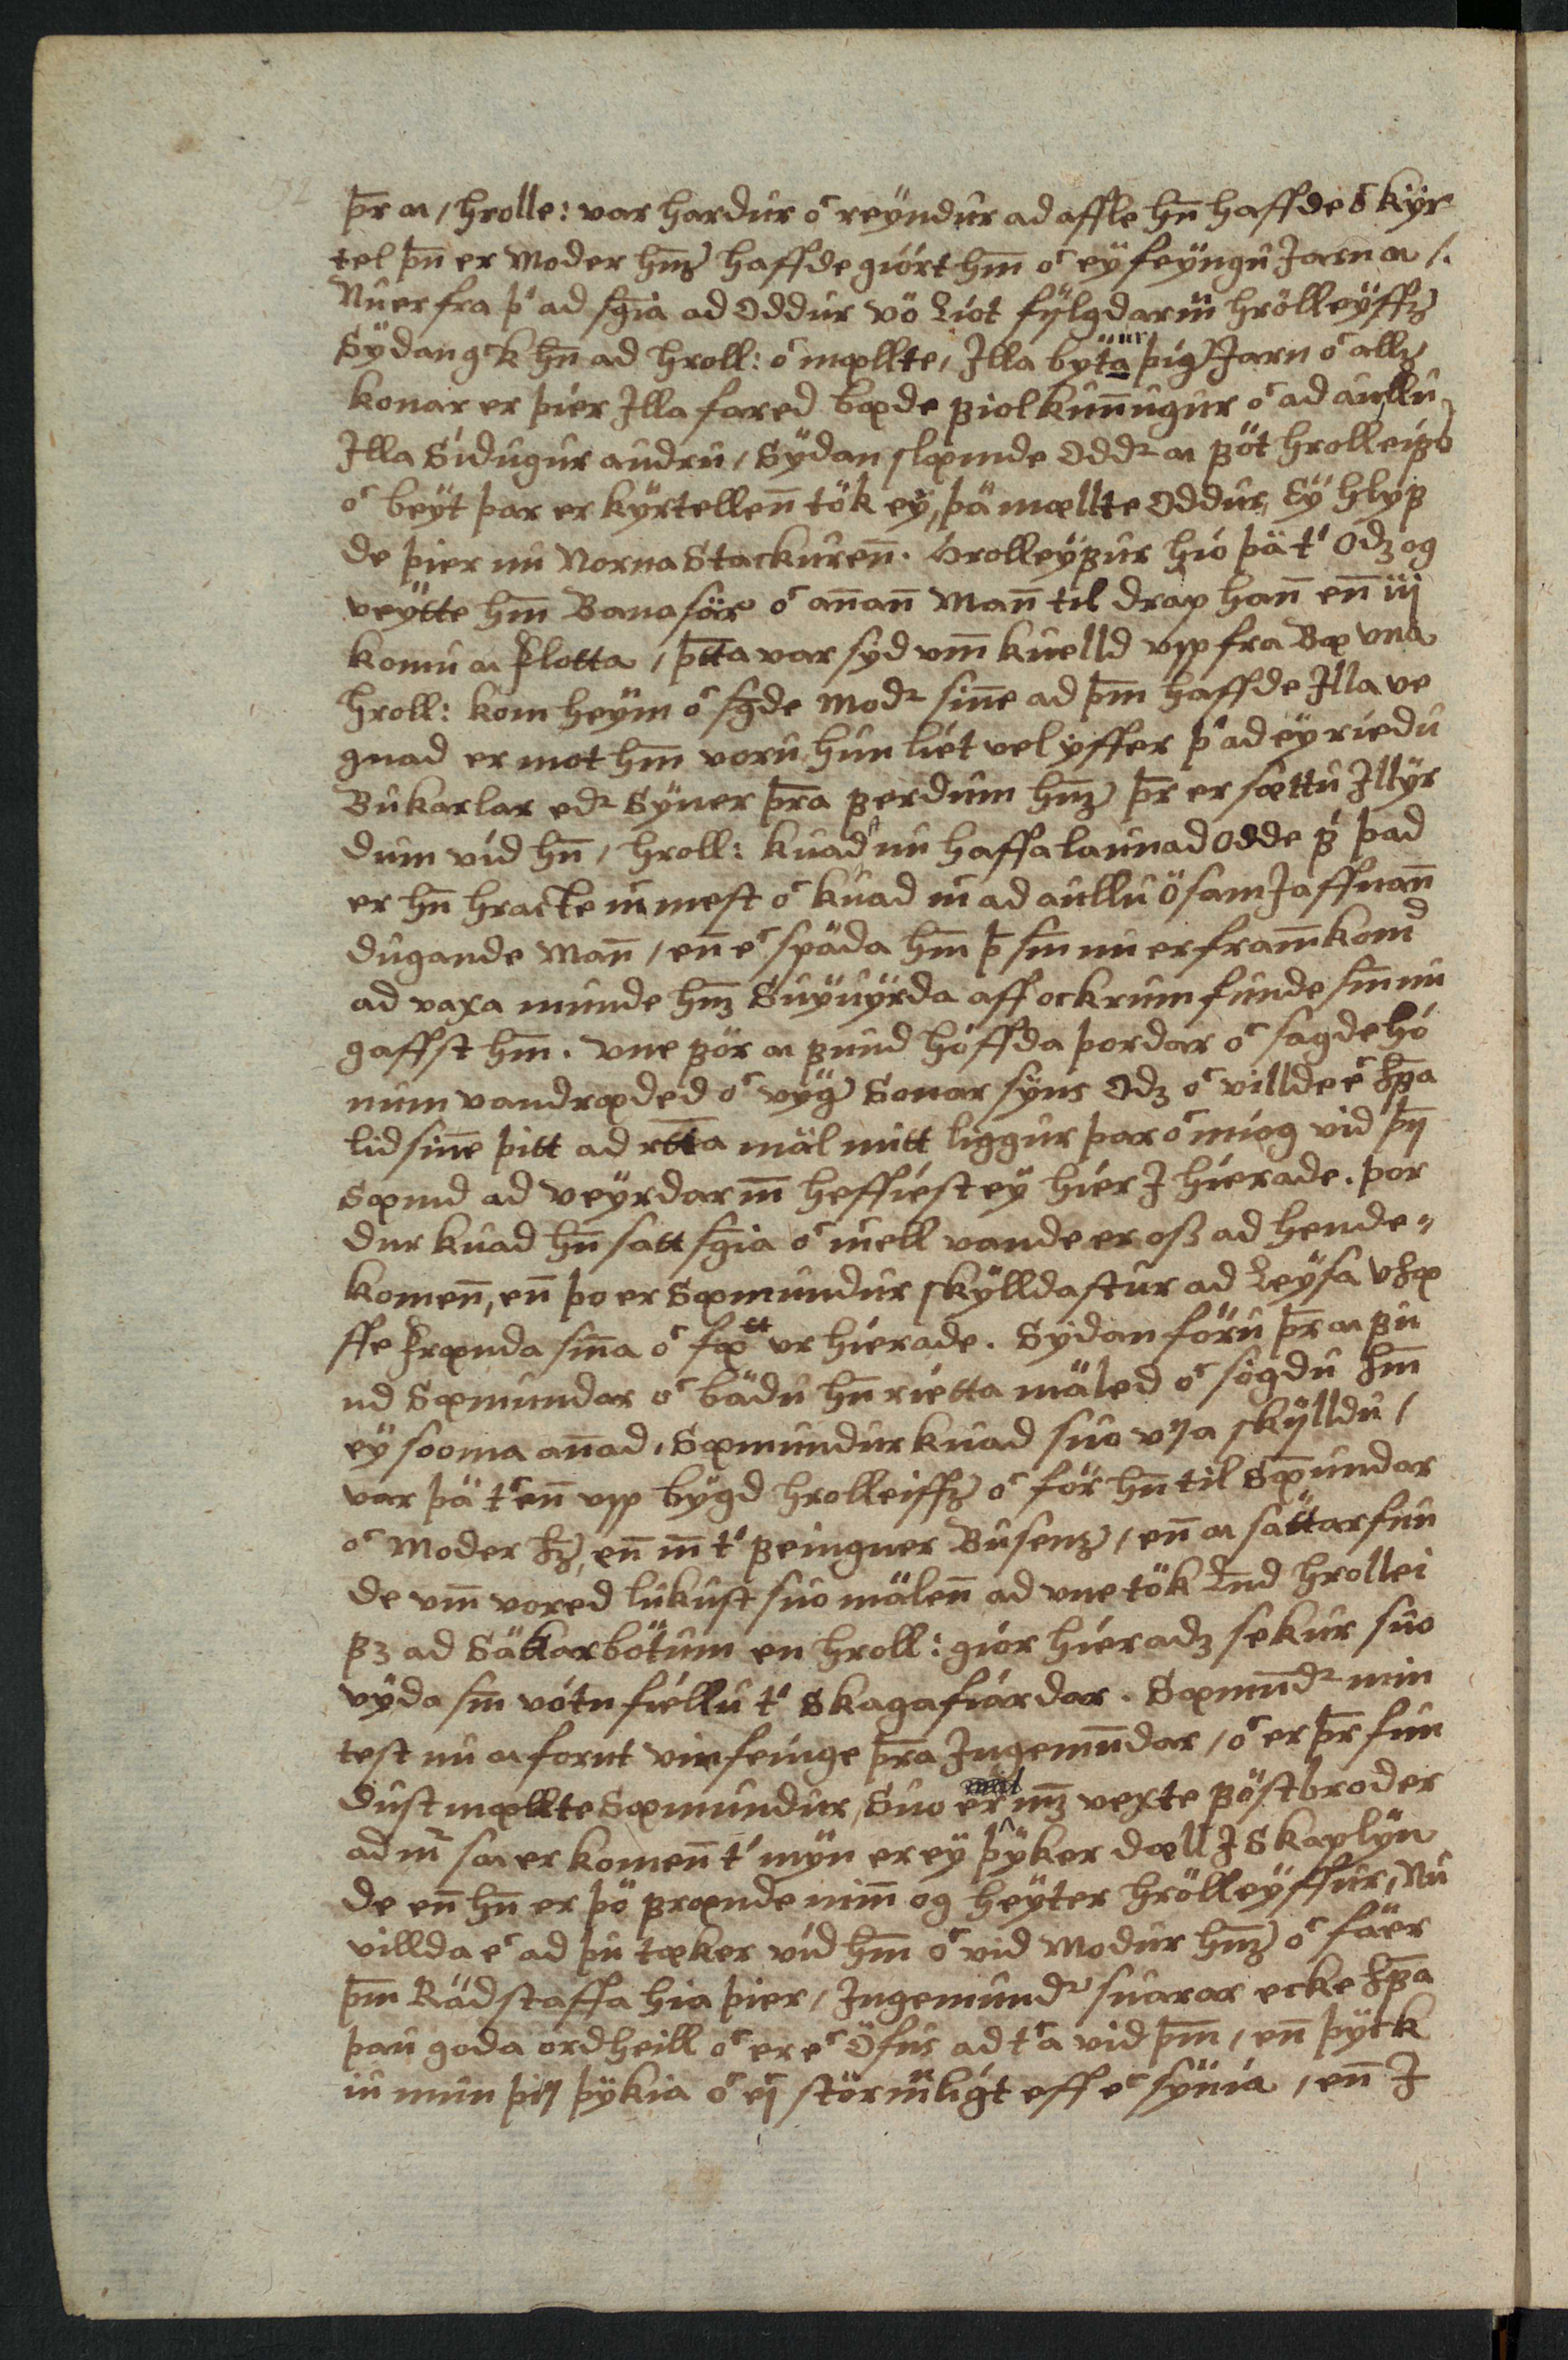 AM 138 fol - 16v